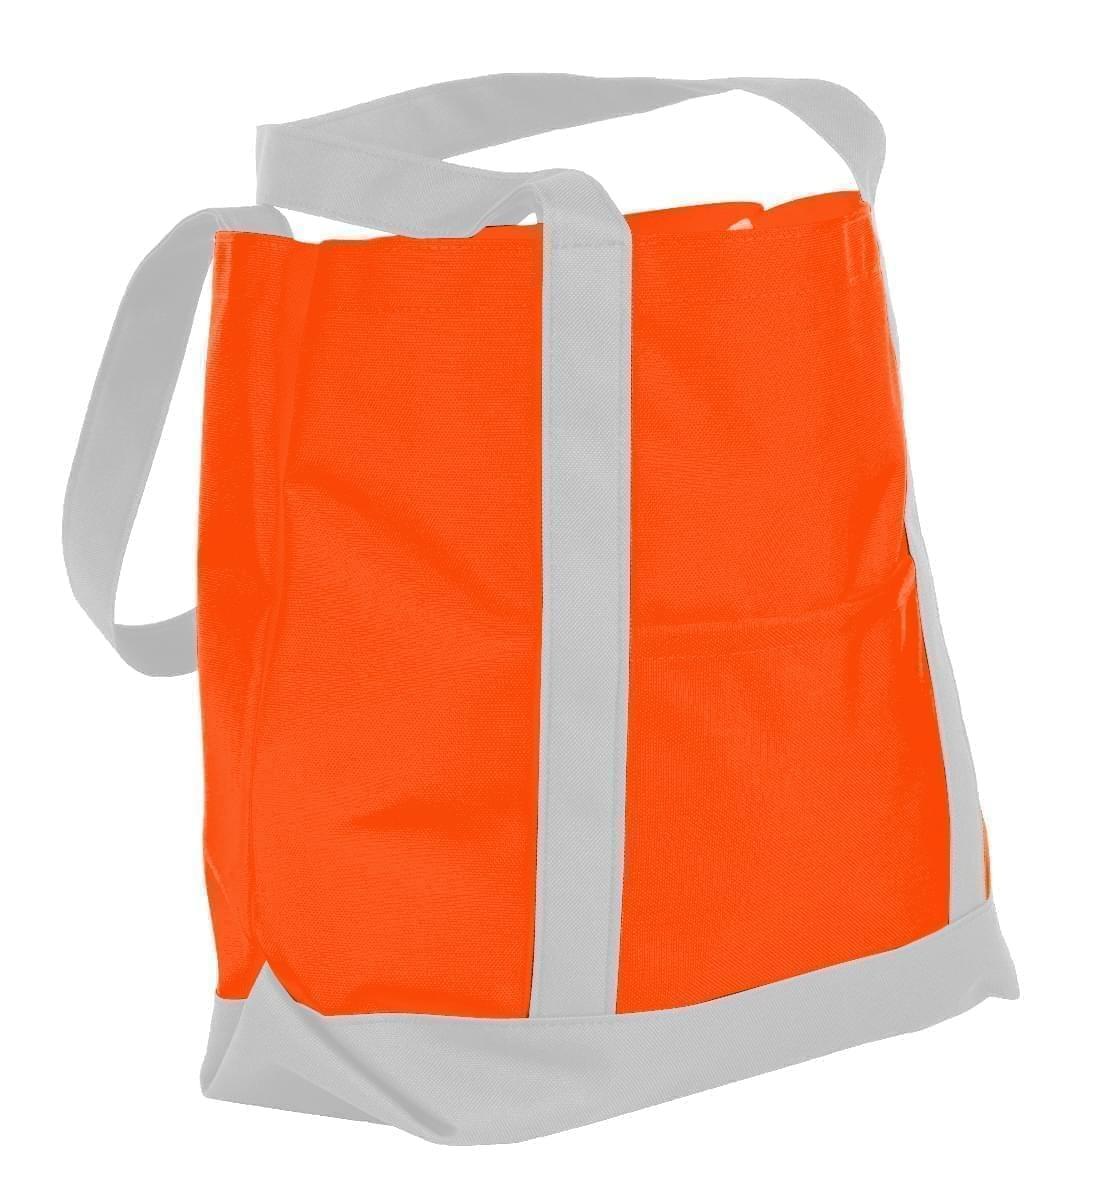 USA Made Nylon Poly Boat Tote Bags, Orange-White, XAACL1UAXP